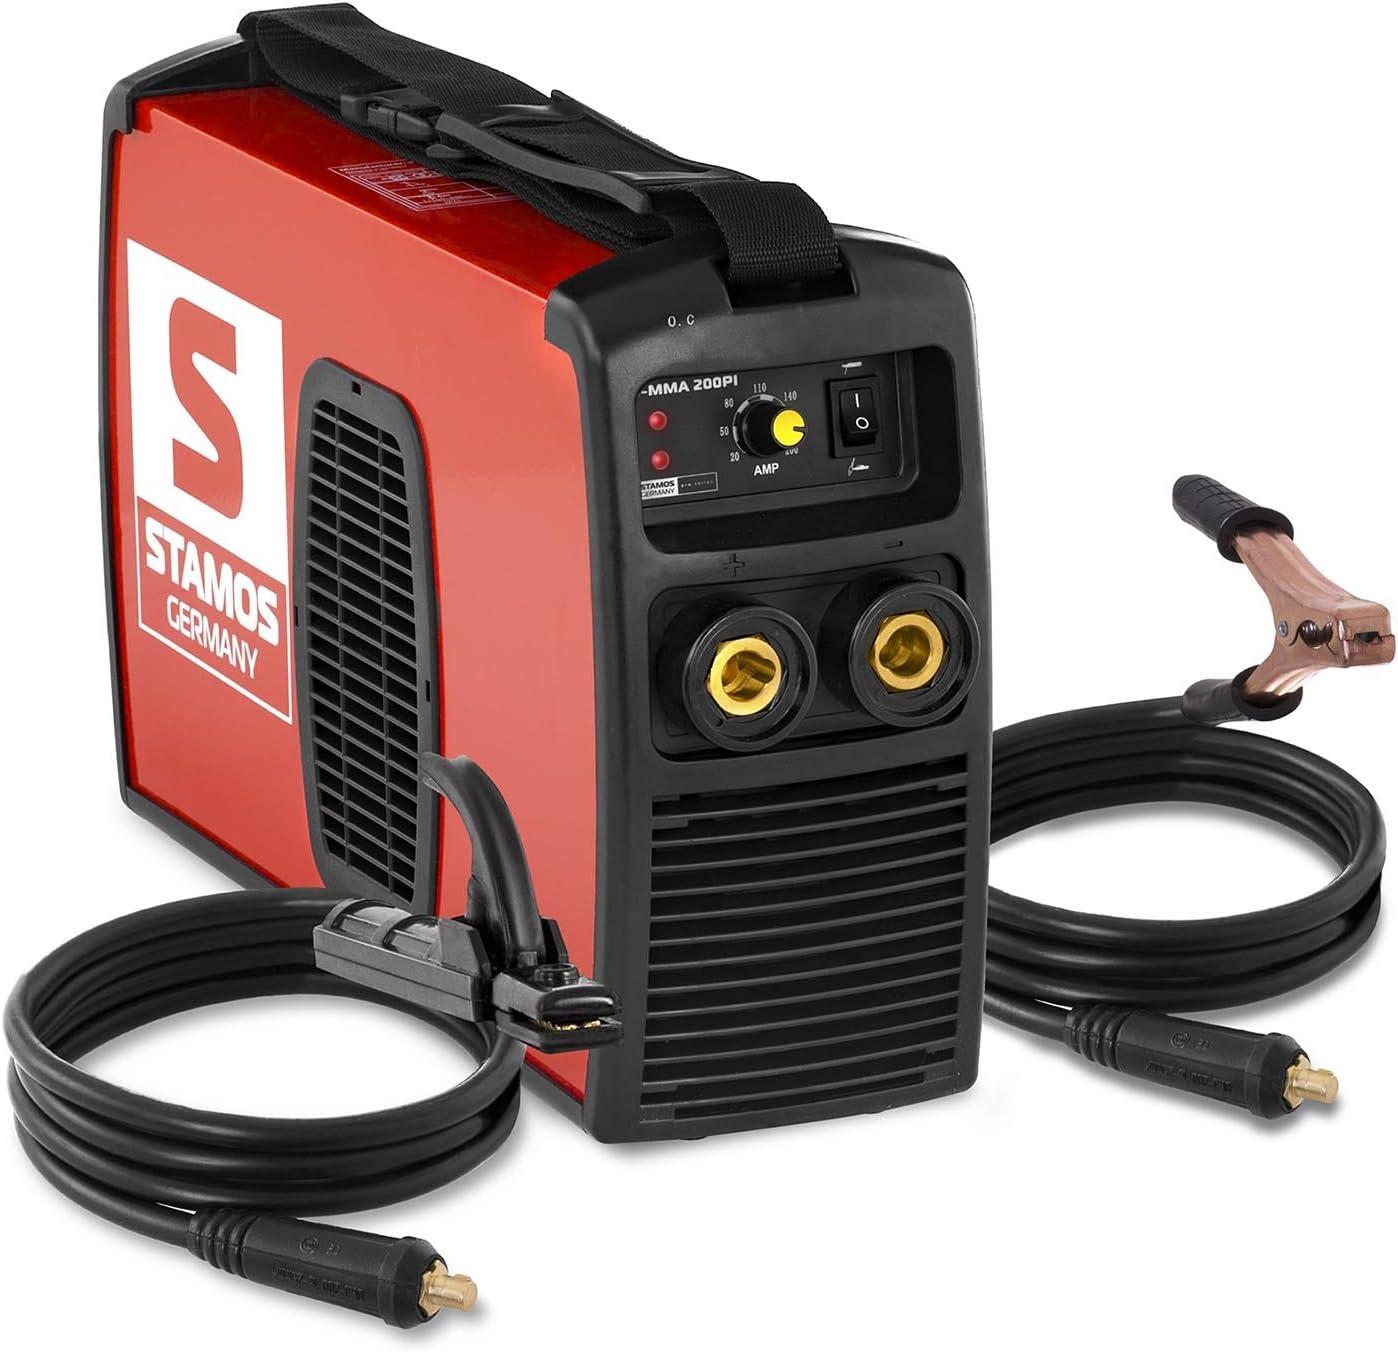 Stamos Germany Poste /à Souder /à lArc Poste a Souder Inverter MMA S-MMA-200-PI Basic 200 A, 230 V, IGBT, Power Ventilateur